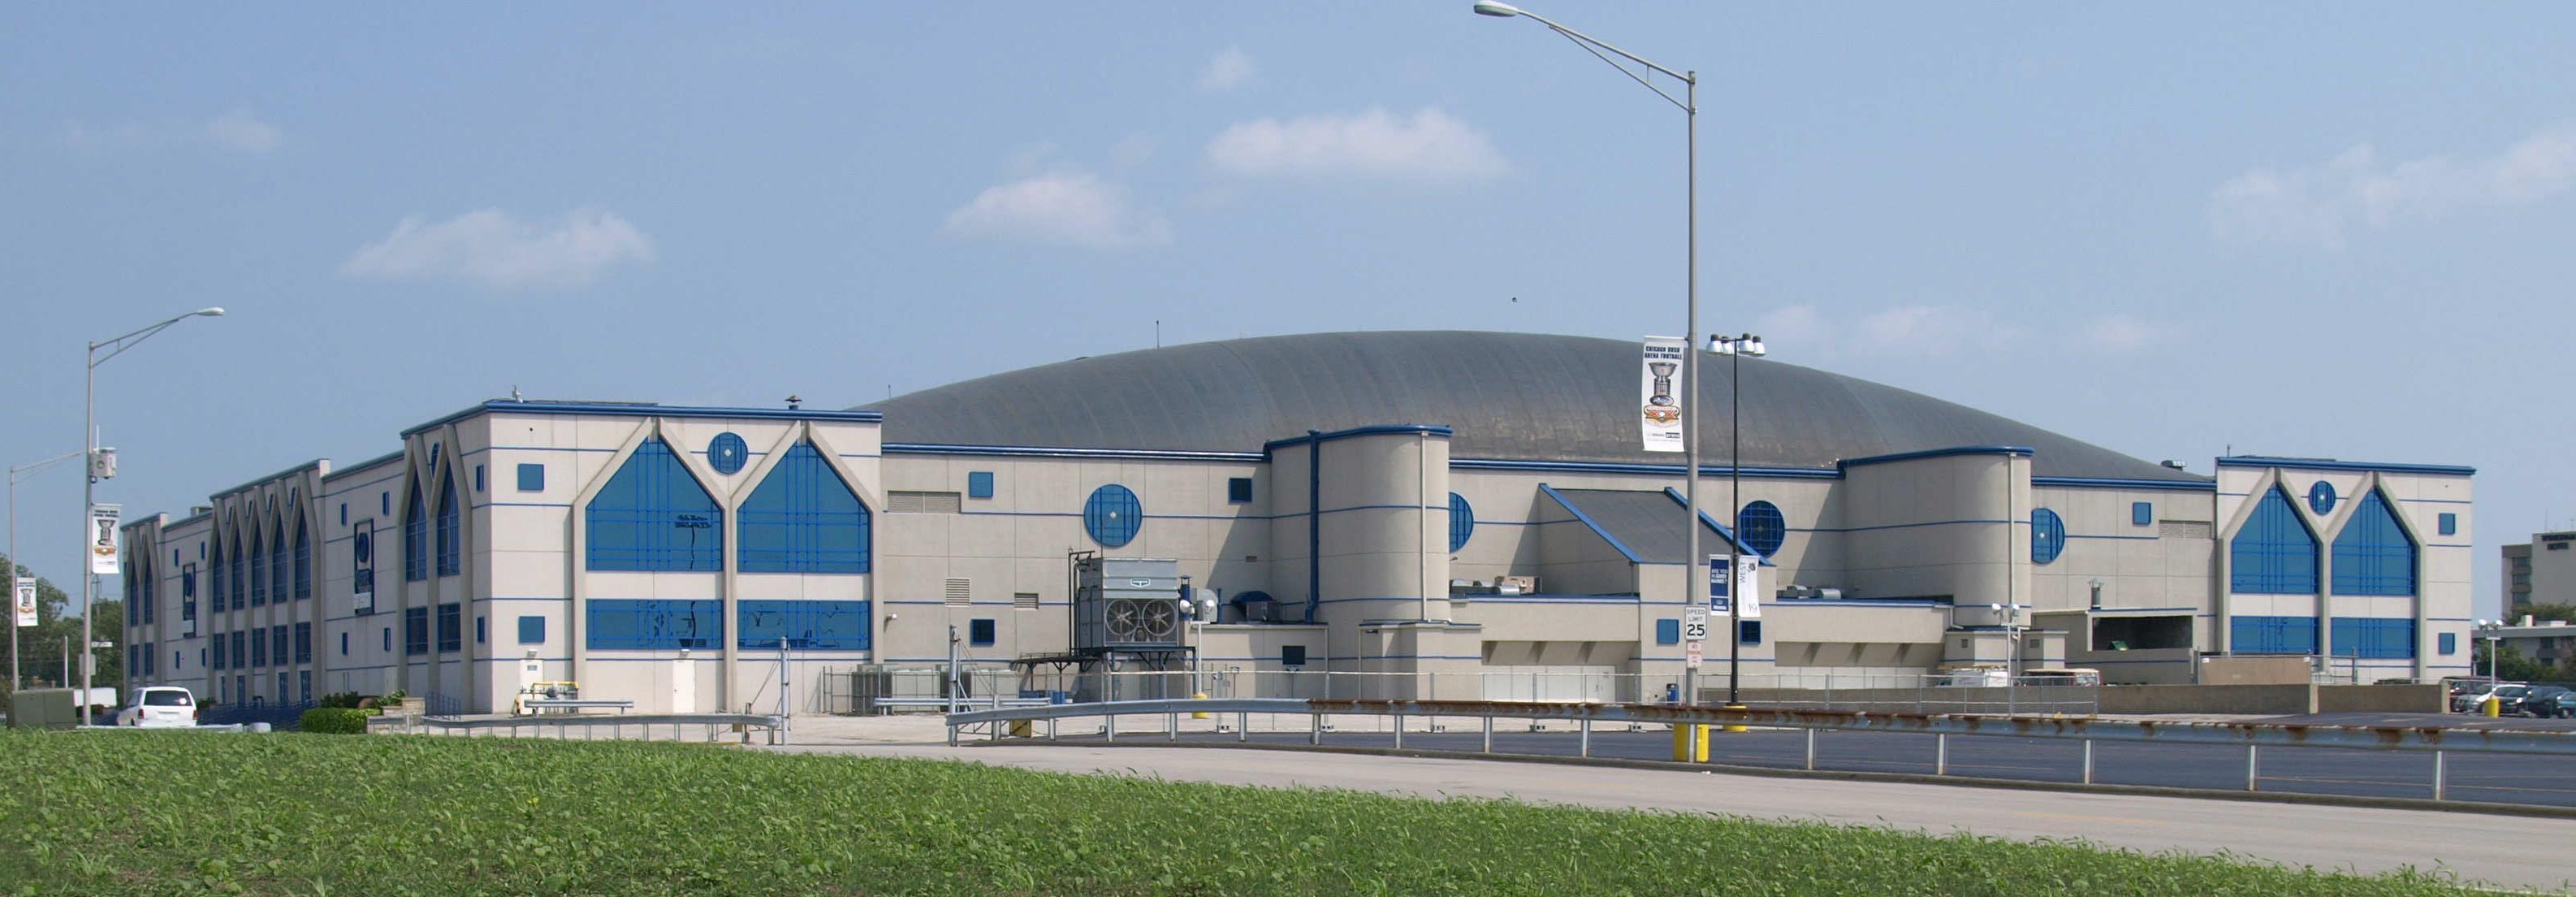 Rosemont Horizon Allstate Arena Rosemont Illinois